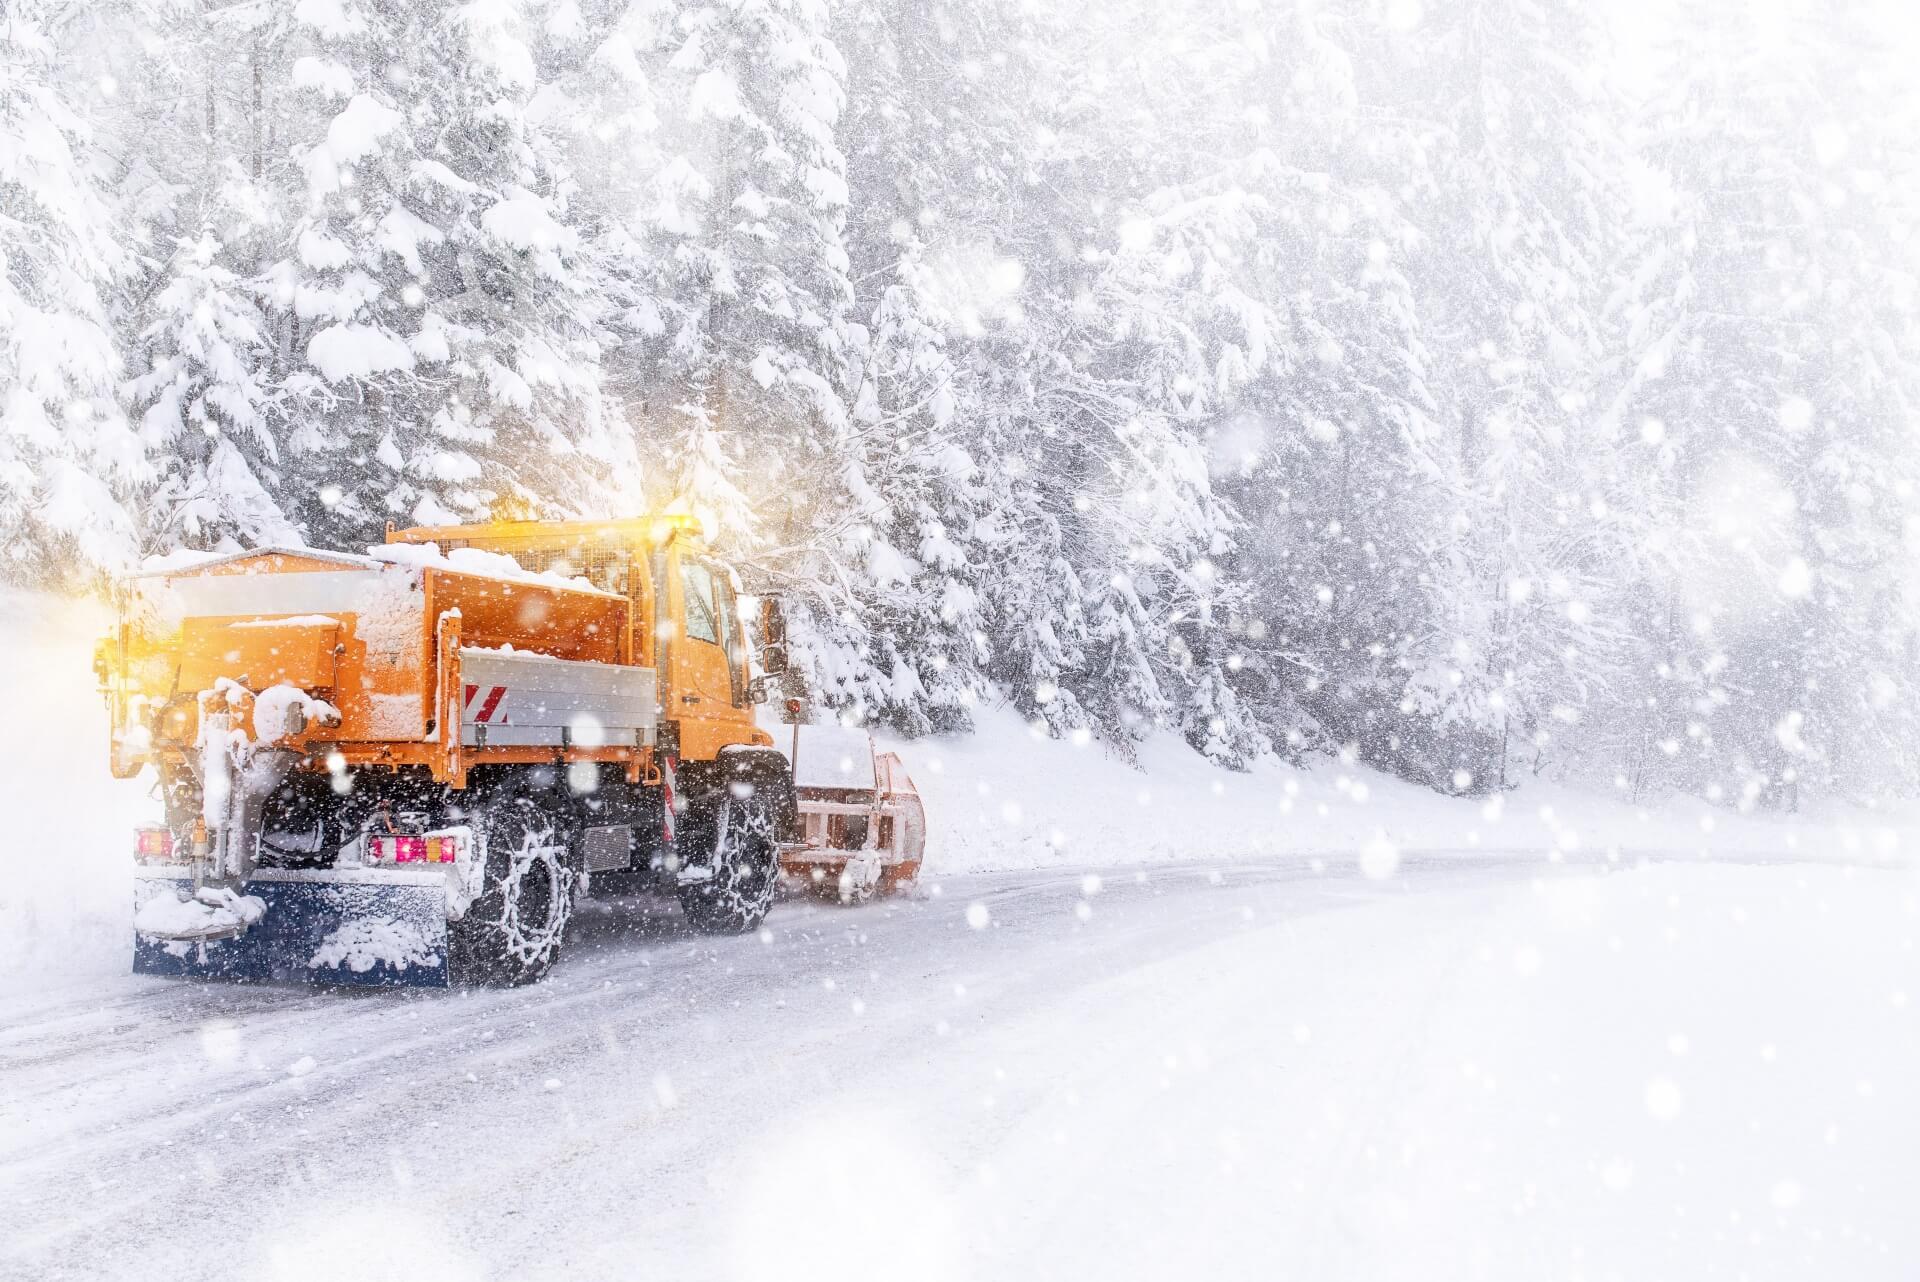 Snowplow on the road